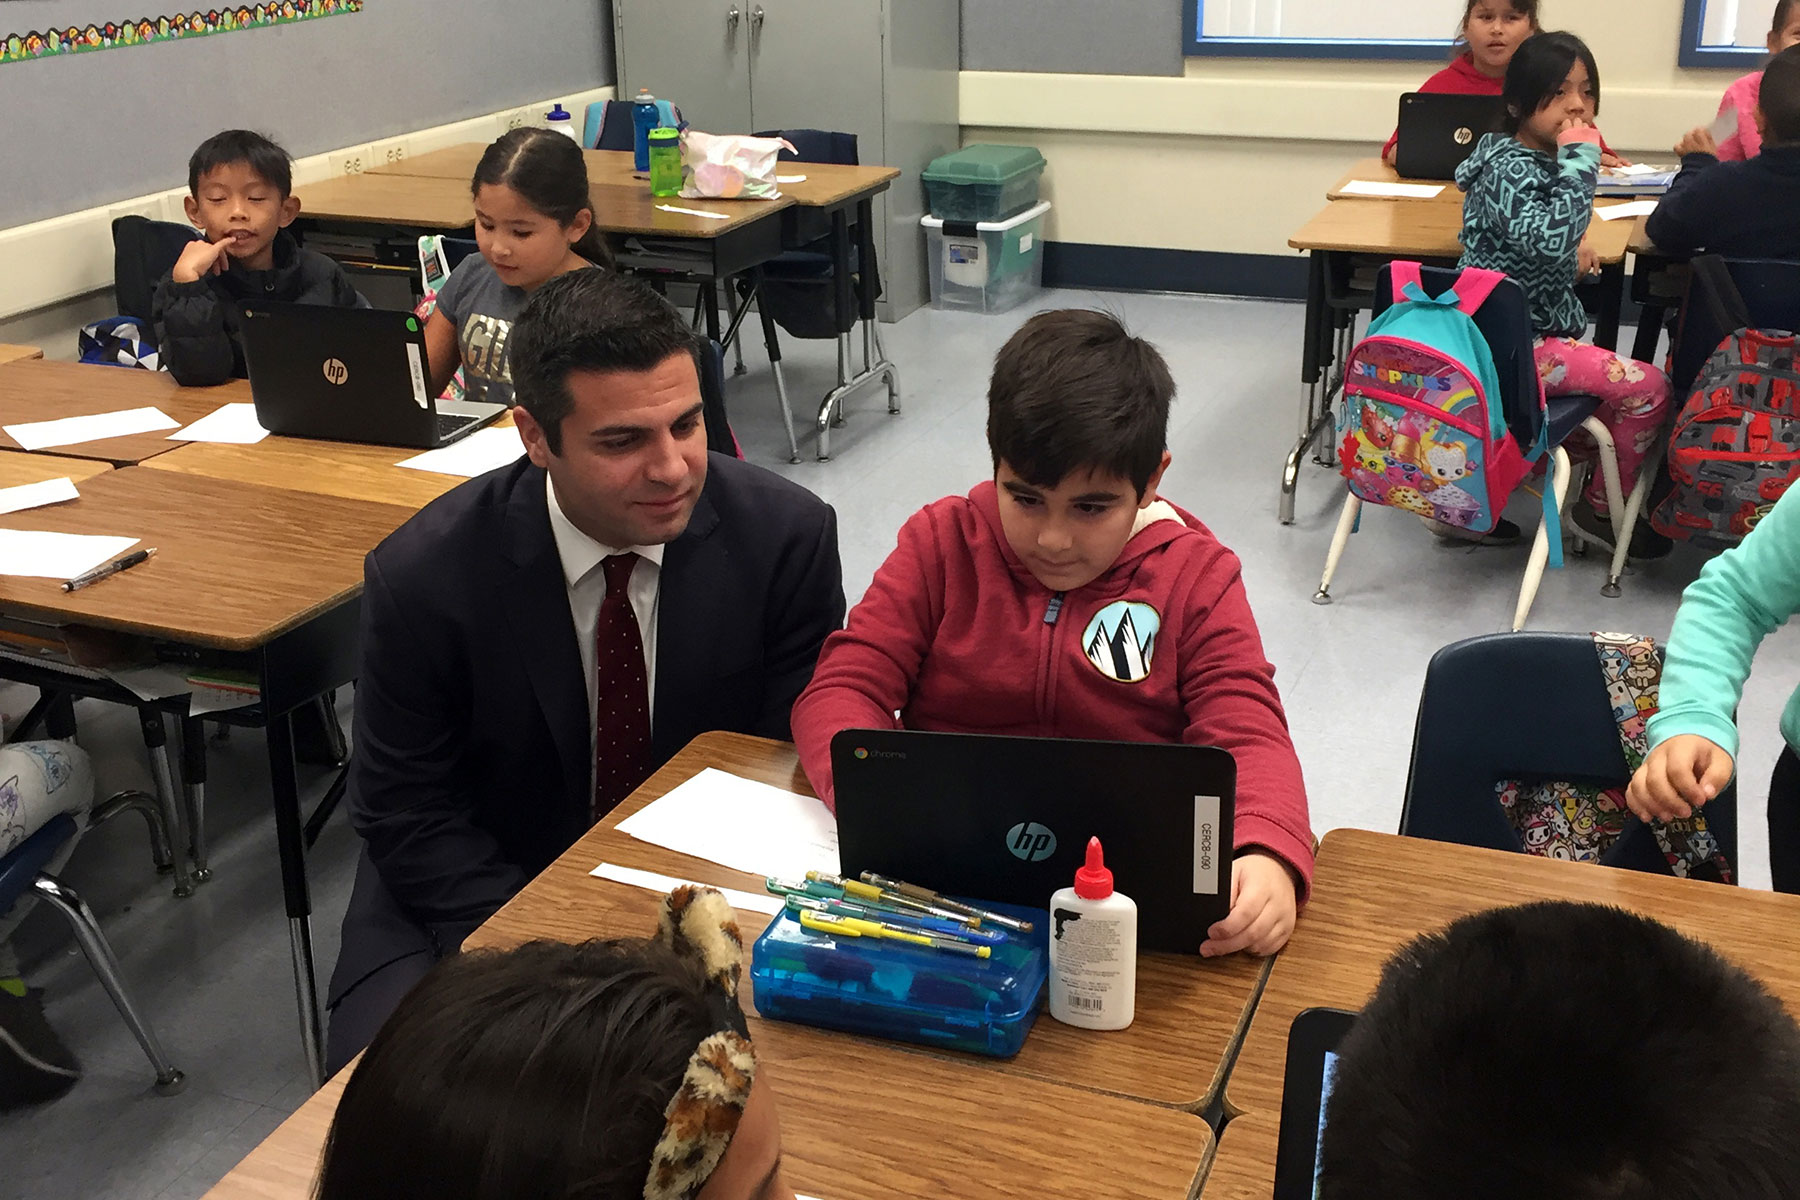 Cerritos Elementary School Coding Showcase January 2018